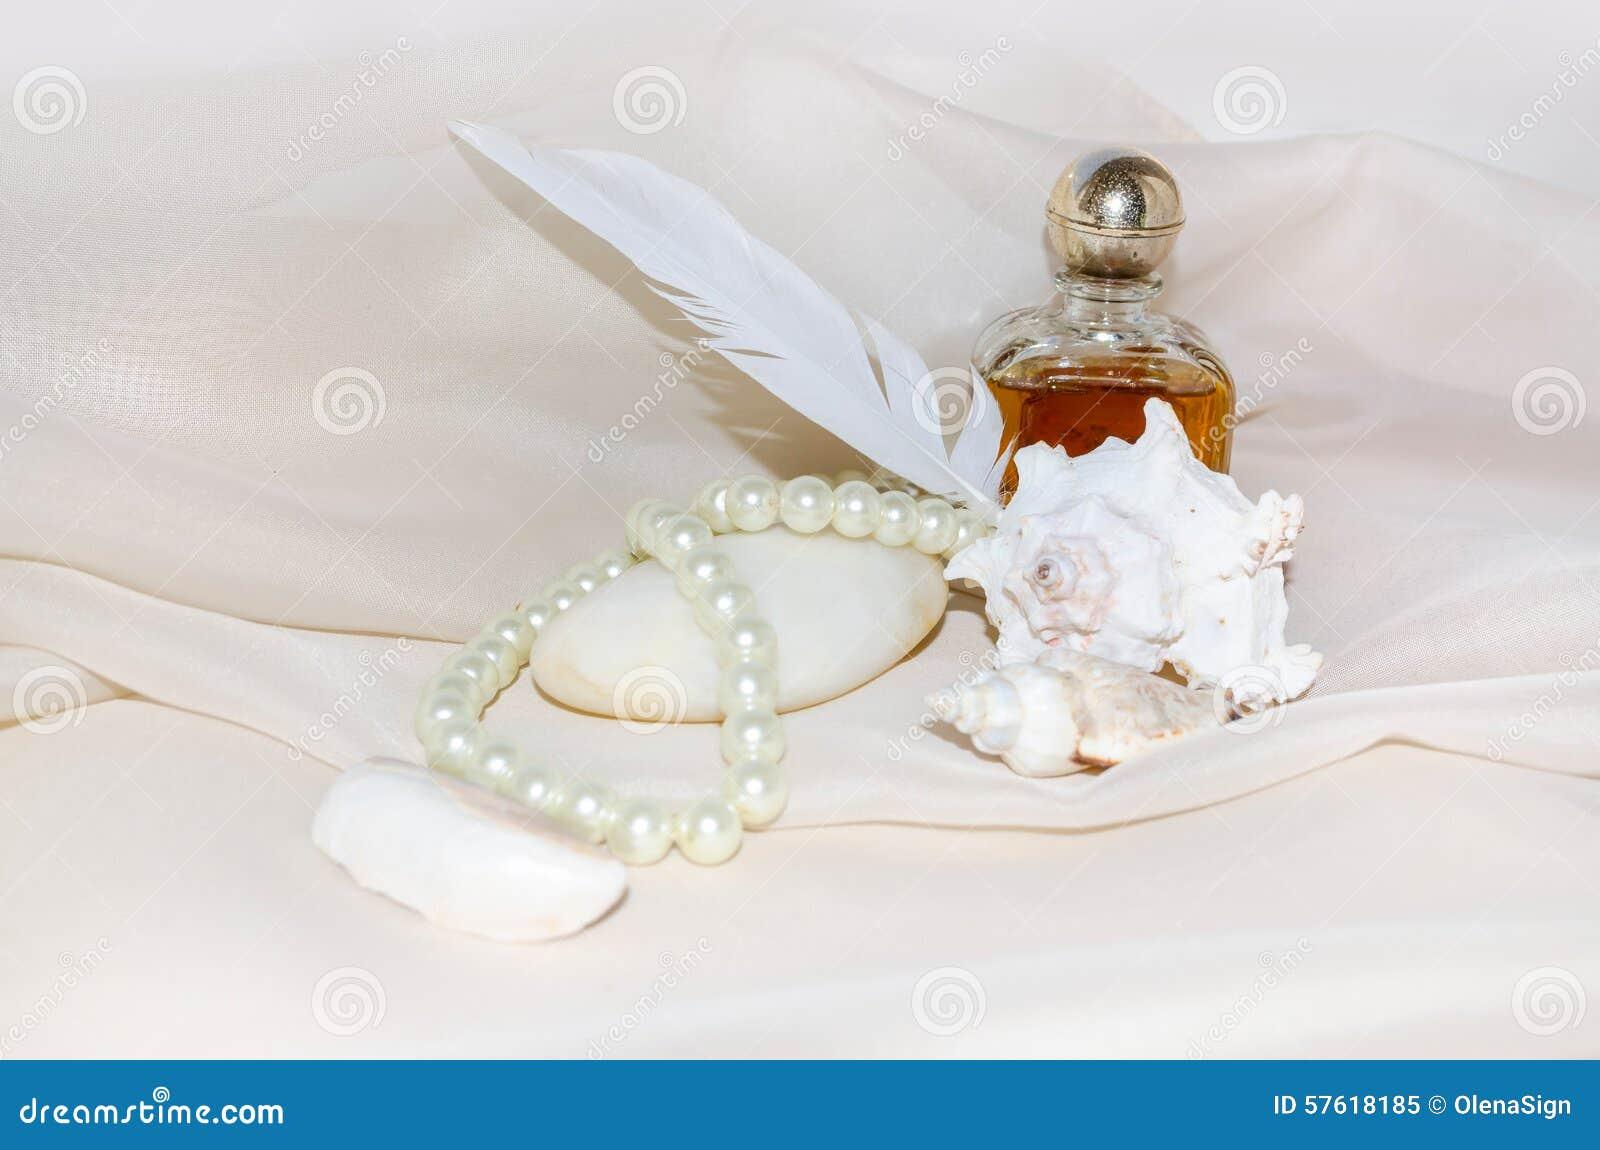 Vintage Perfume Bottle With Pearls, Shellfish, White Sea ...